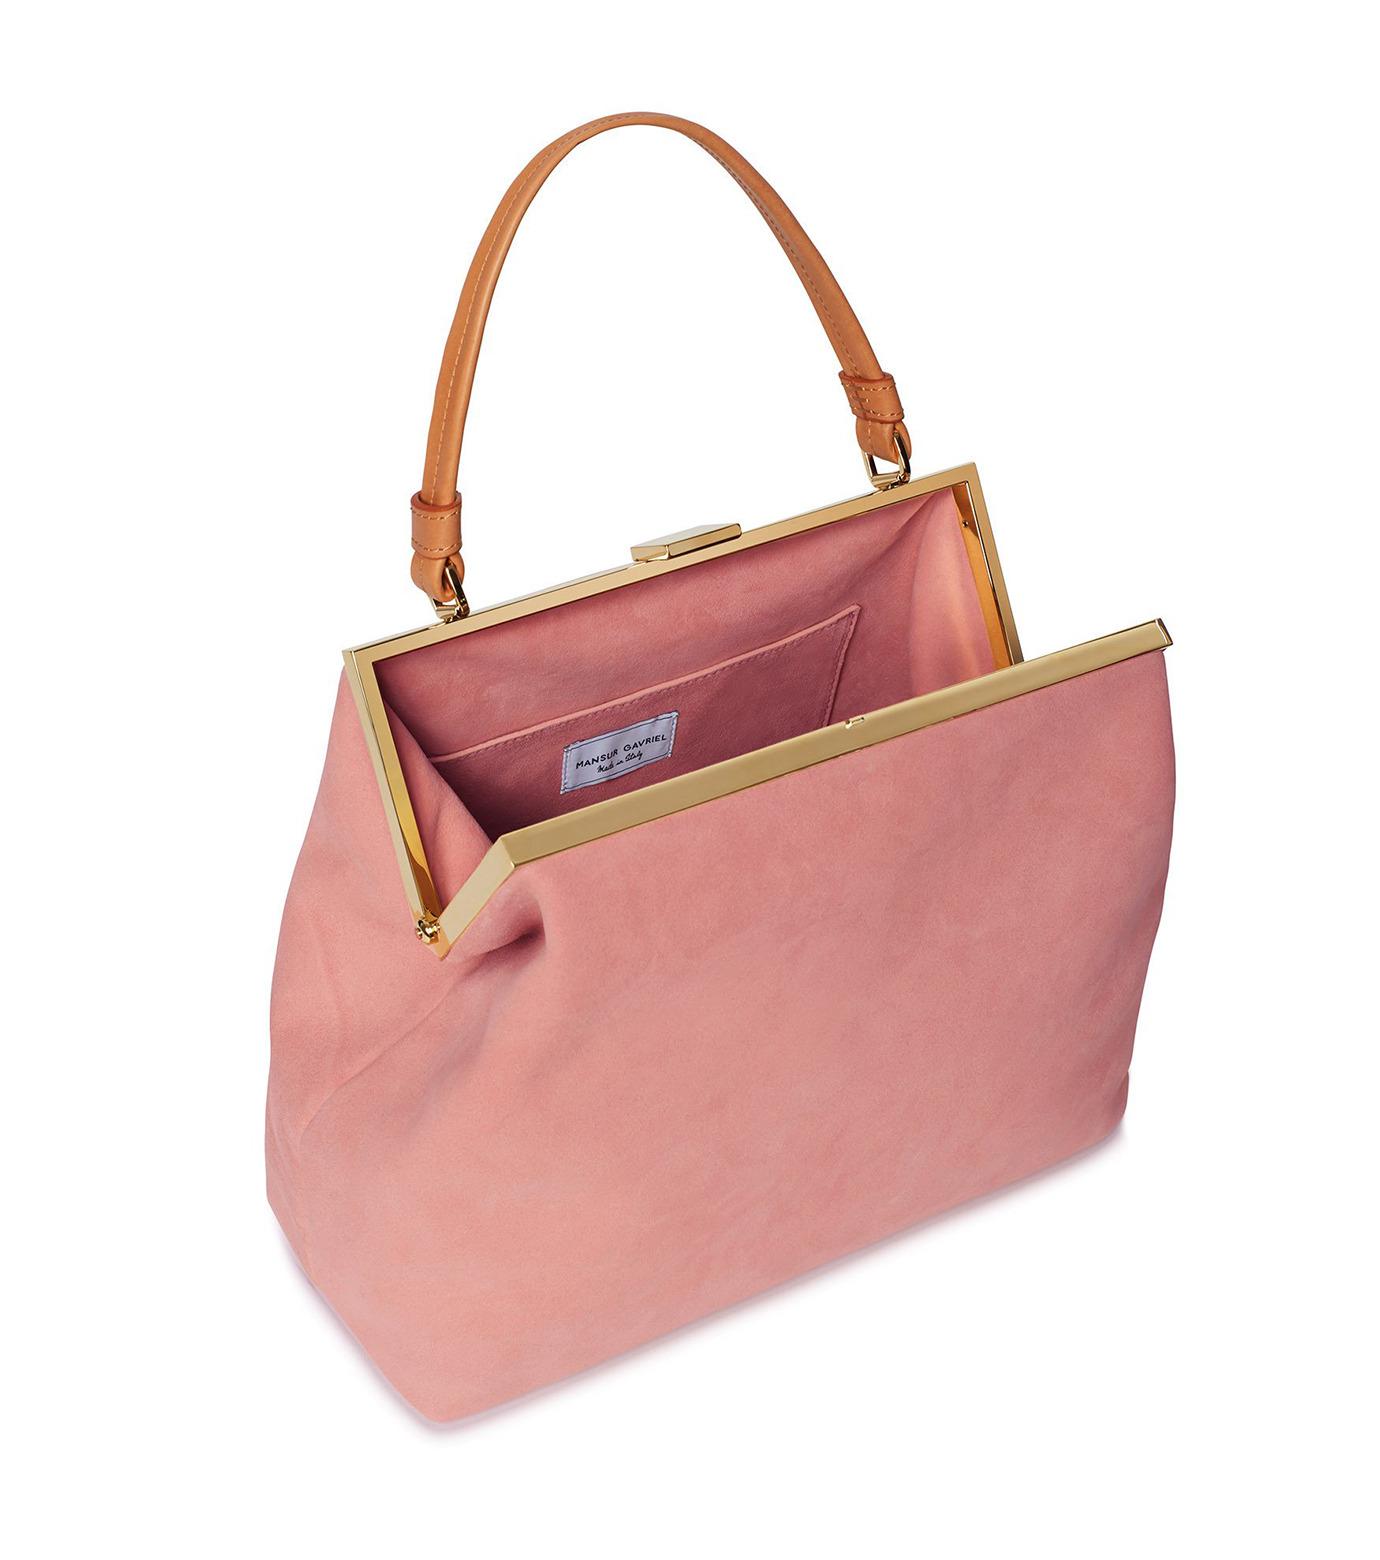 Mansur Gavriel(マンサーガブリエル)のsuede elegant bag-LIGHT PINK(ハンドバッグ/hand bag)-HEB024SU-71 拡大詳細画像3